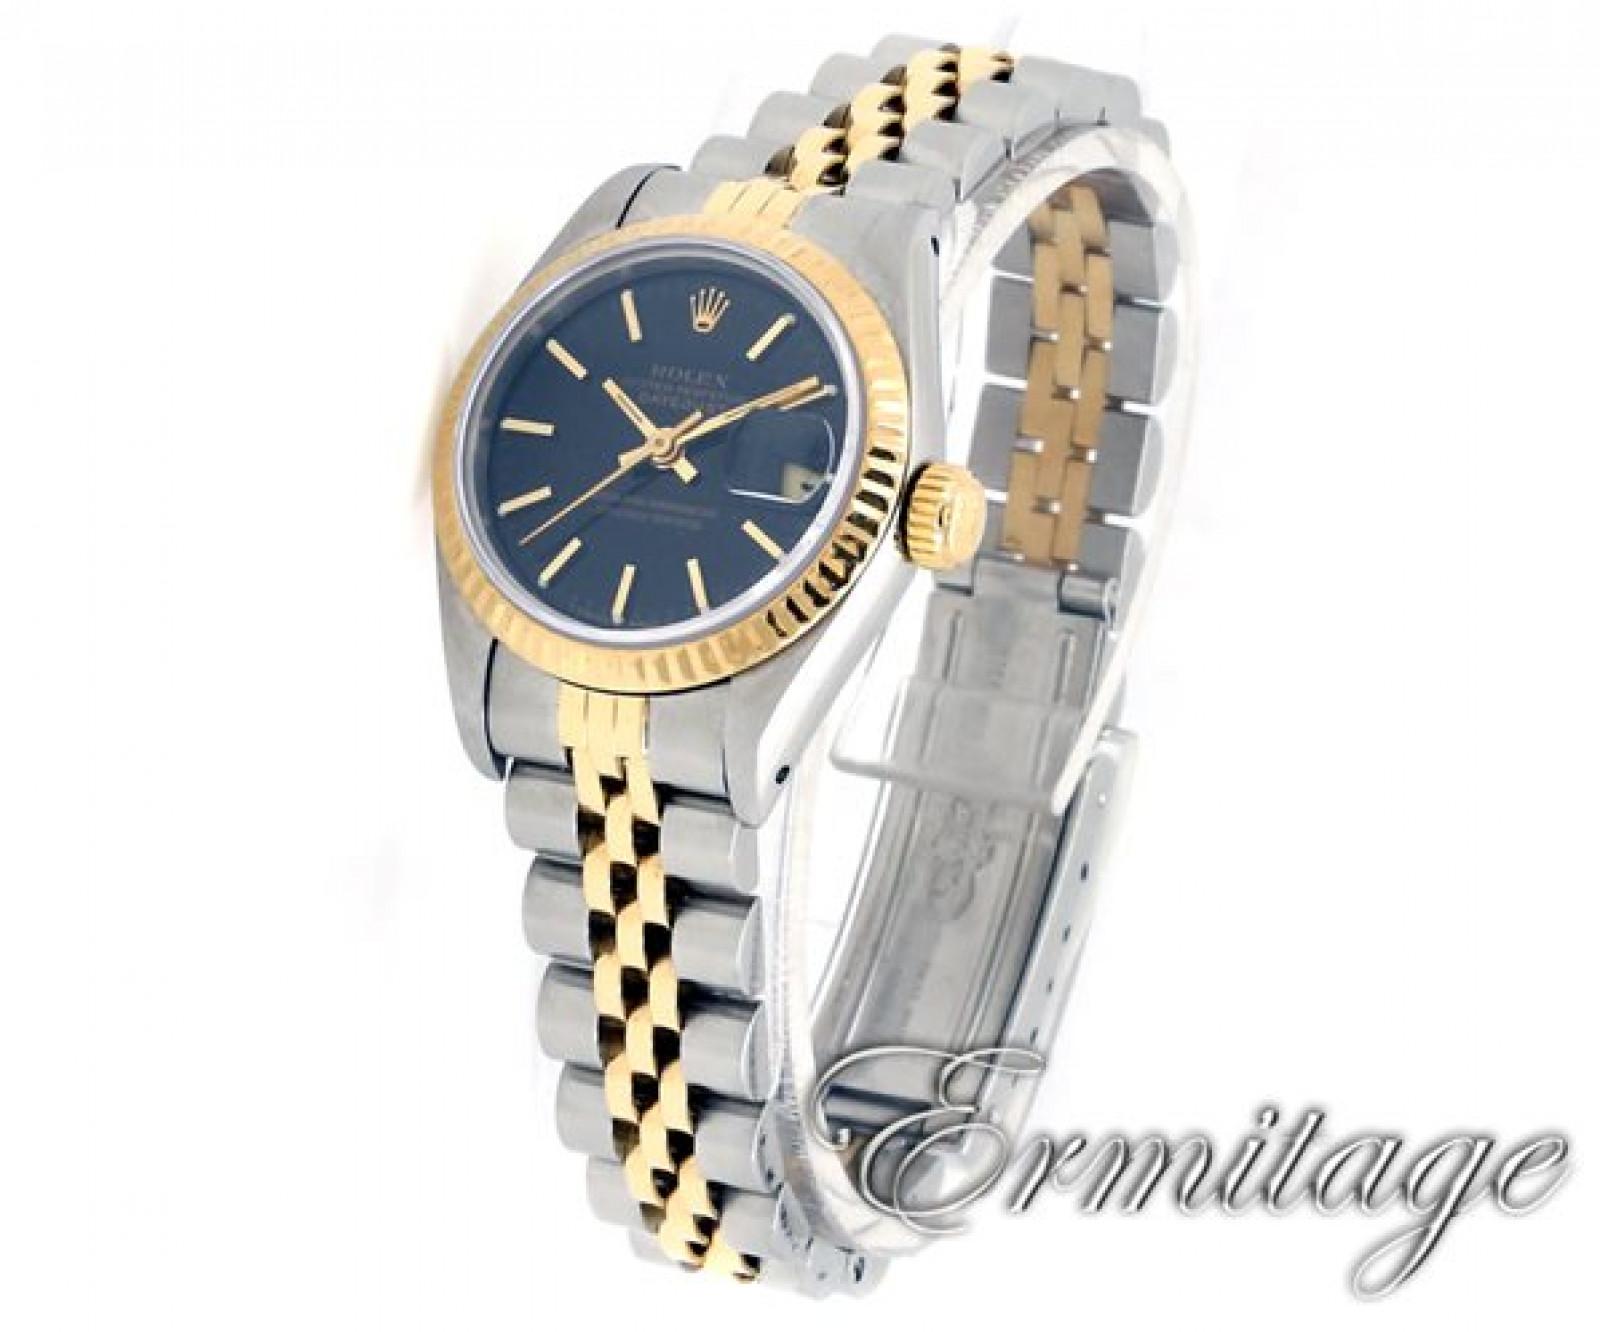 Sell Rolex Datejust 69173 Gold & Steel